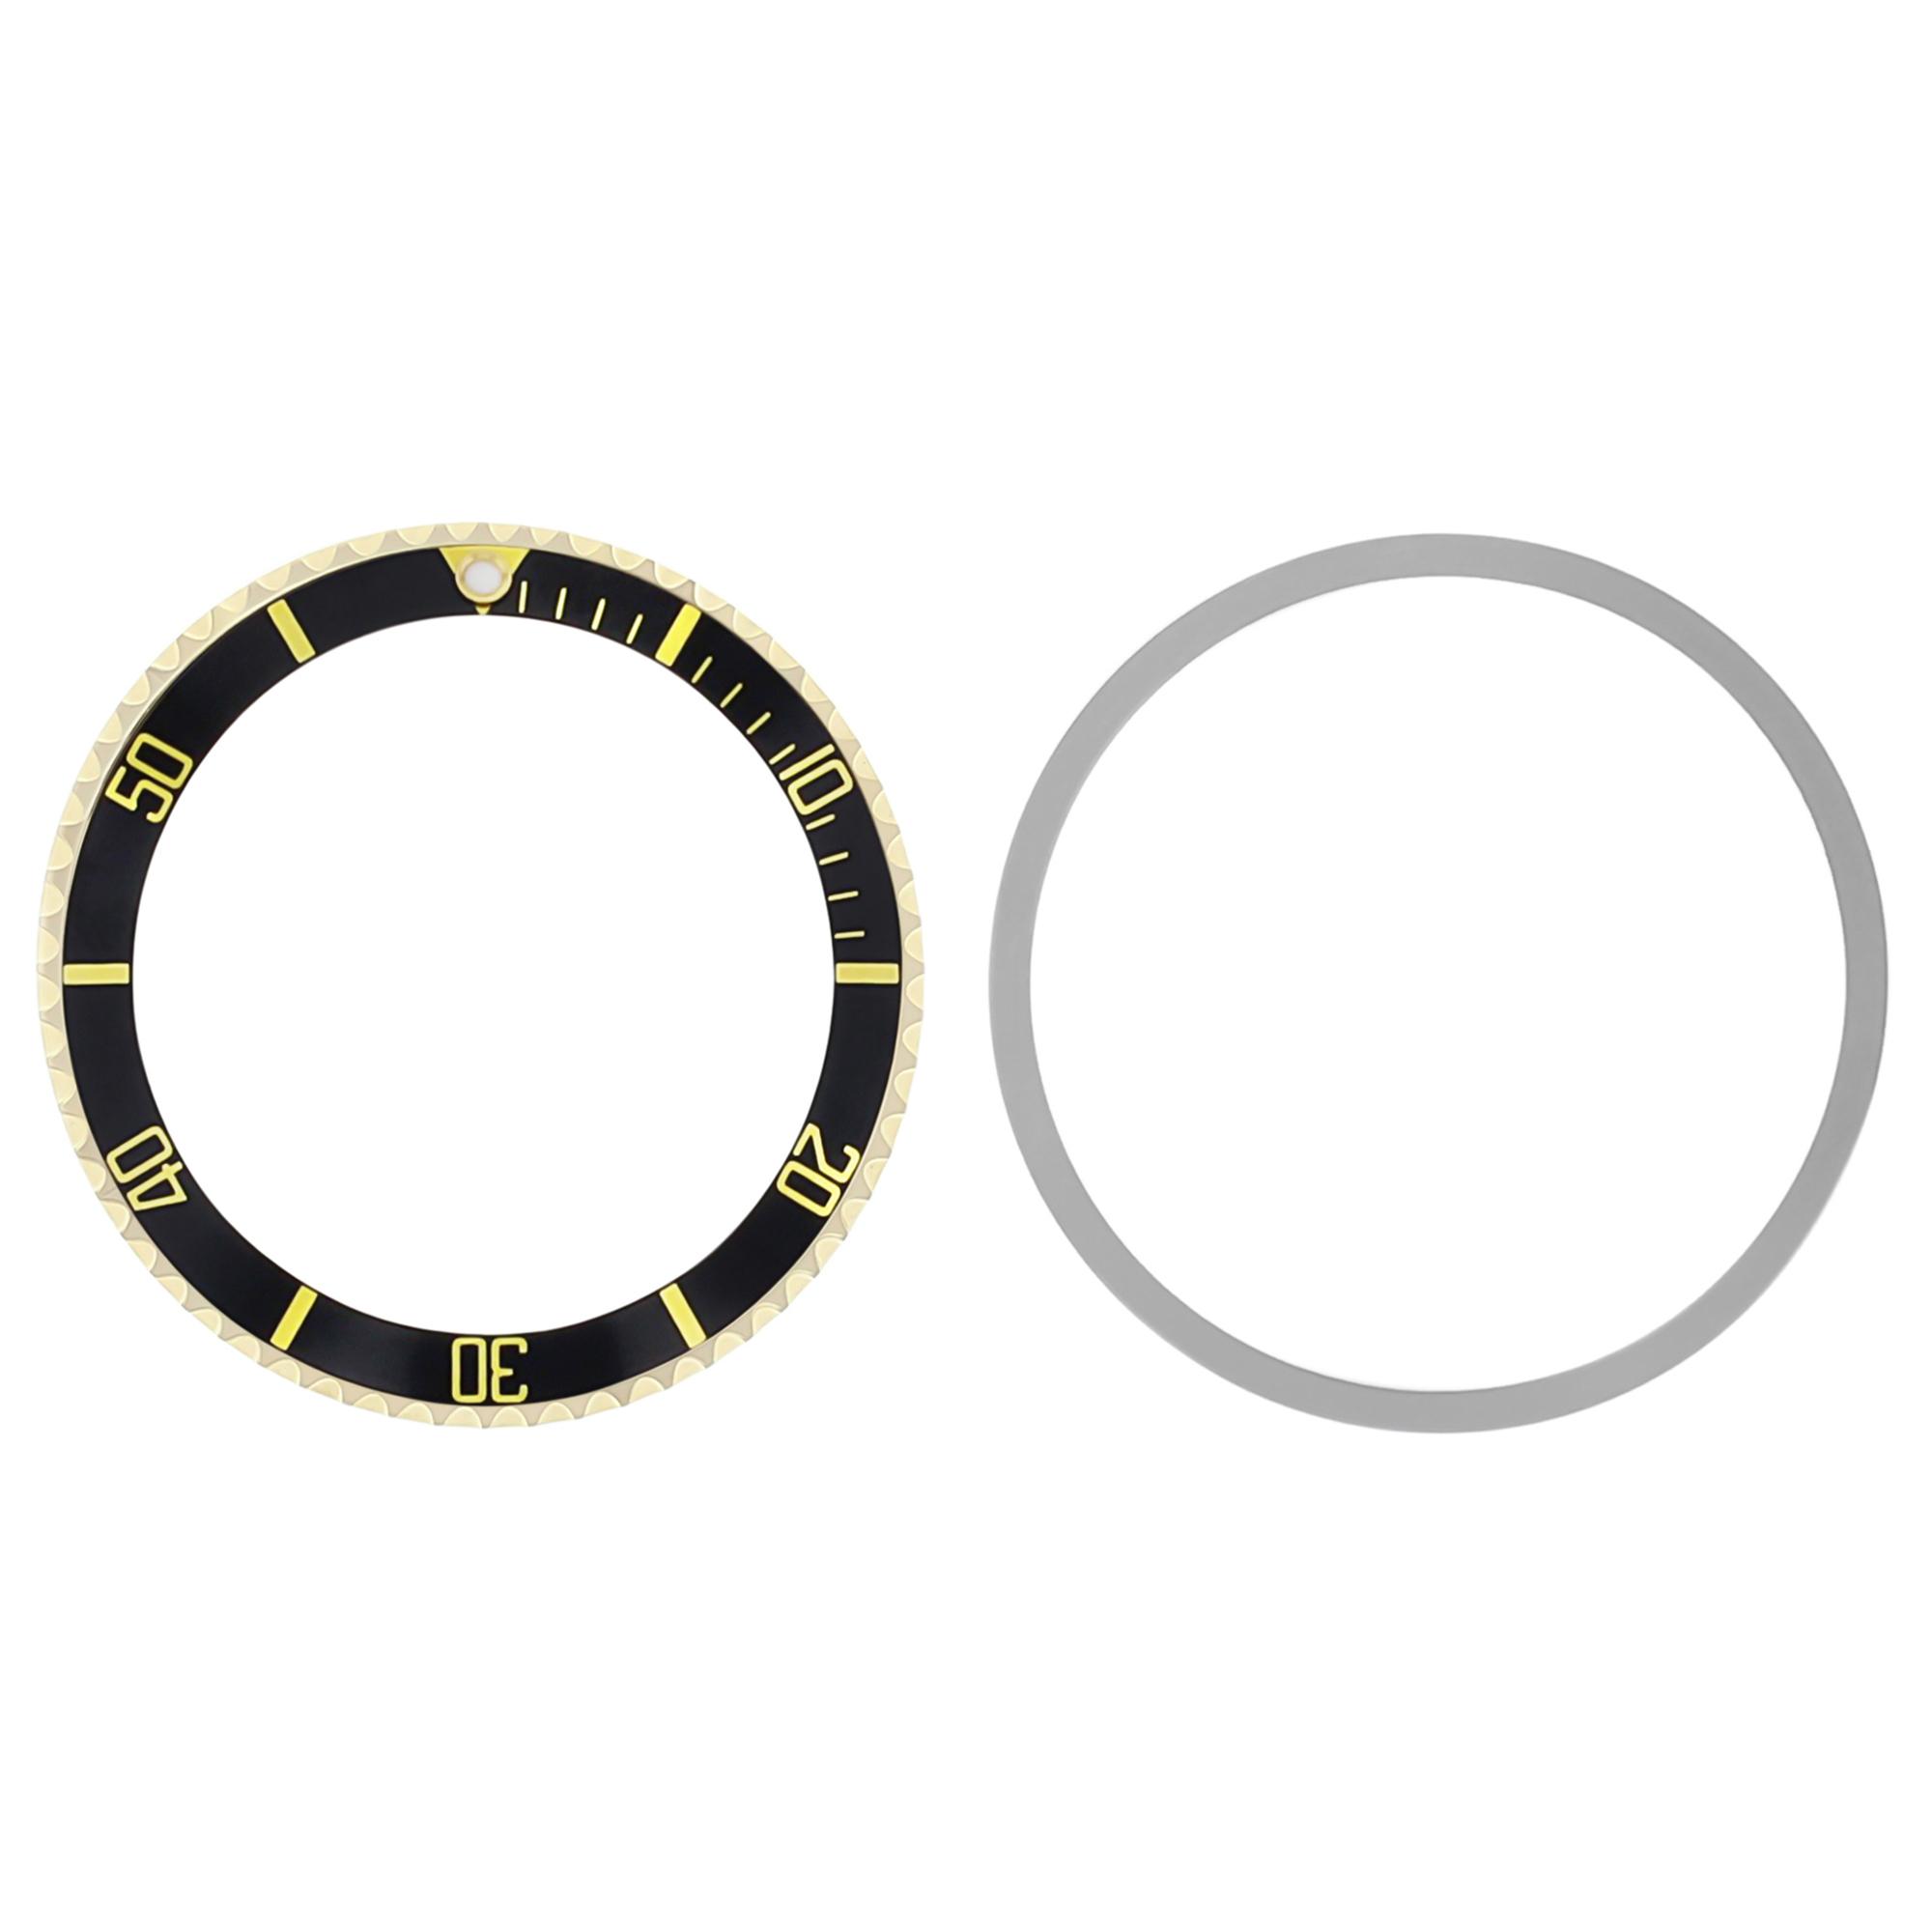 BEZEL+ INSERT FOR VINTAGE TUDOR SUBMARINER 18KY REAL GOLD 9401, 7016 WATCH BLACK